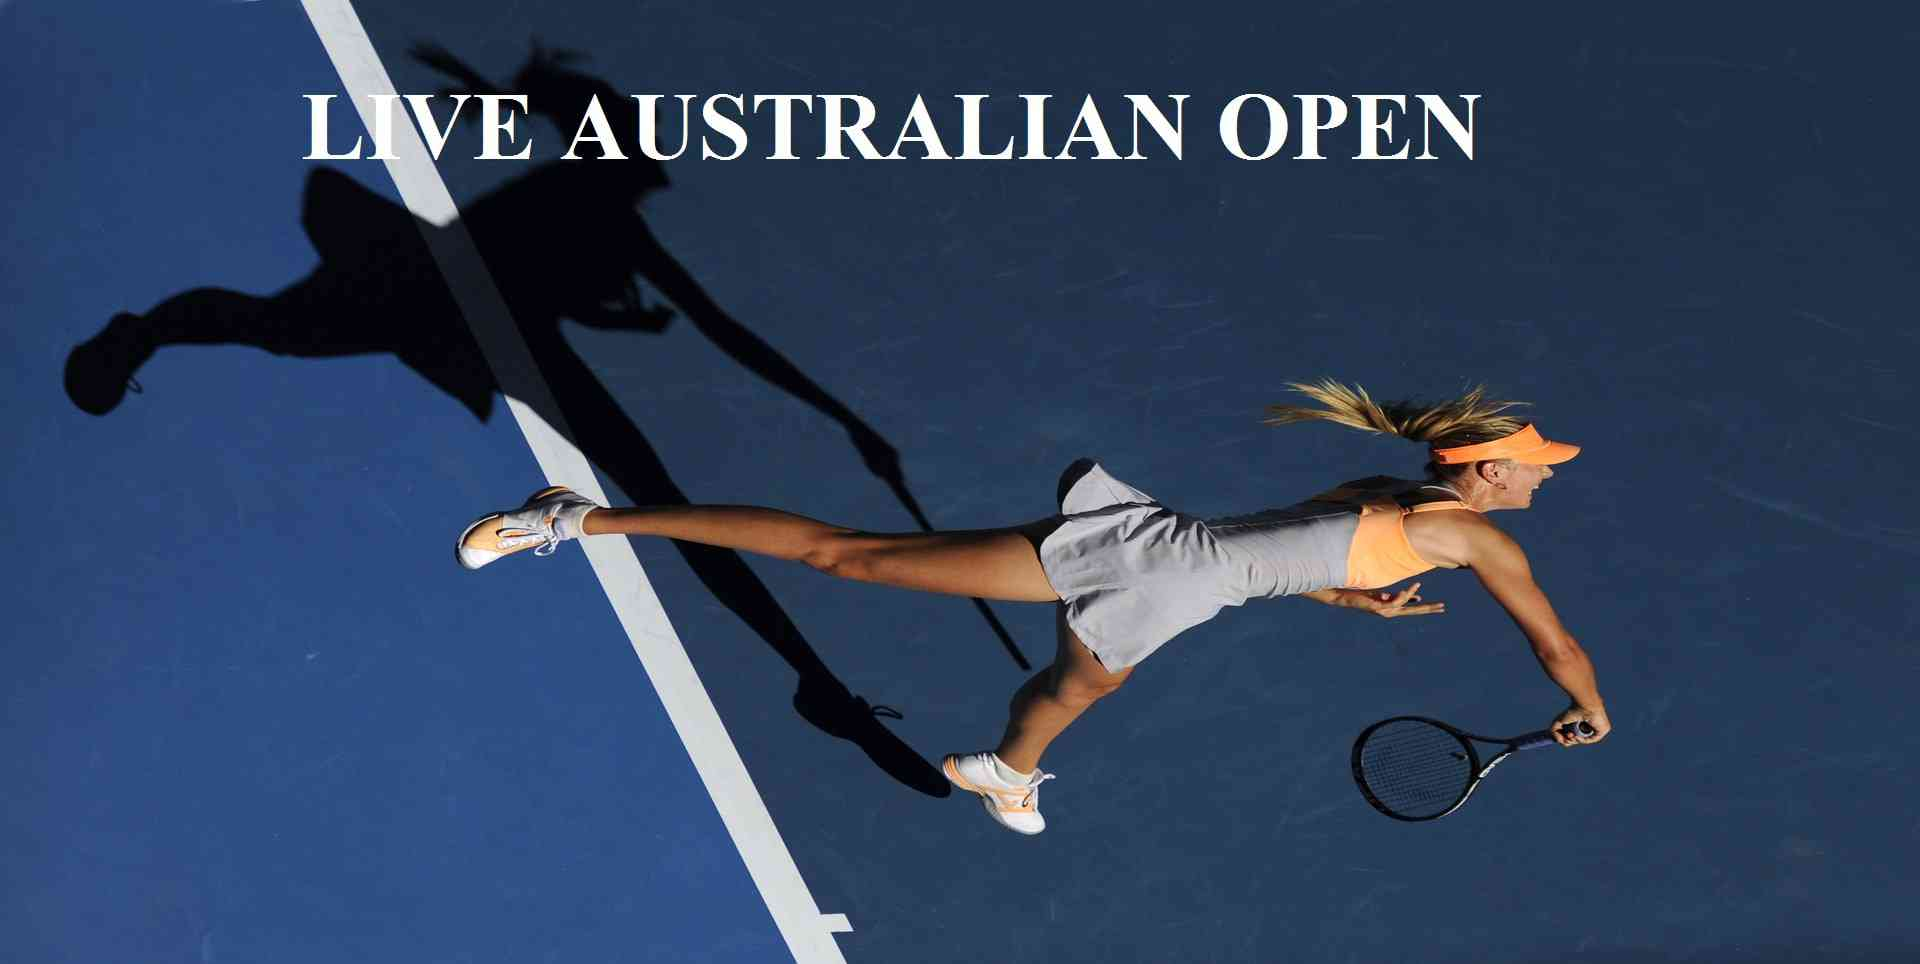 2018 Australian Open openning ceremony